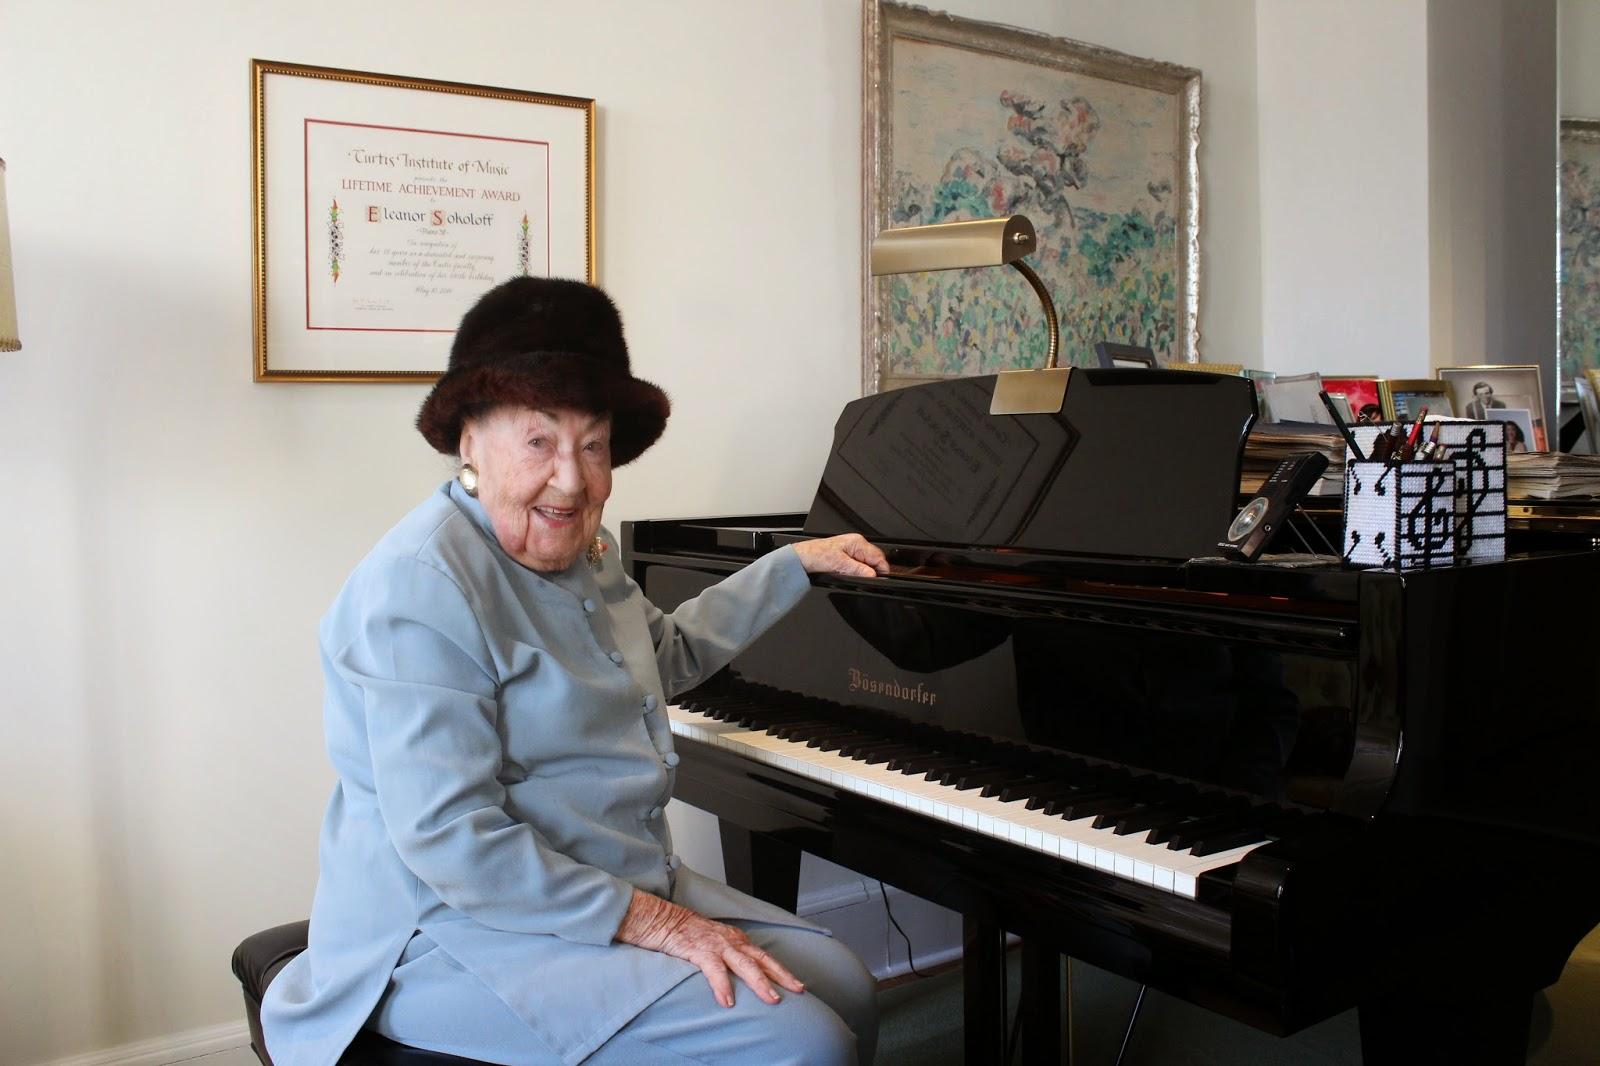 Eleanor Sokoloff